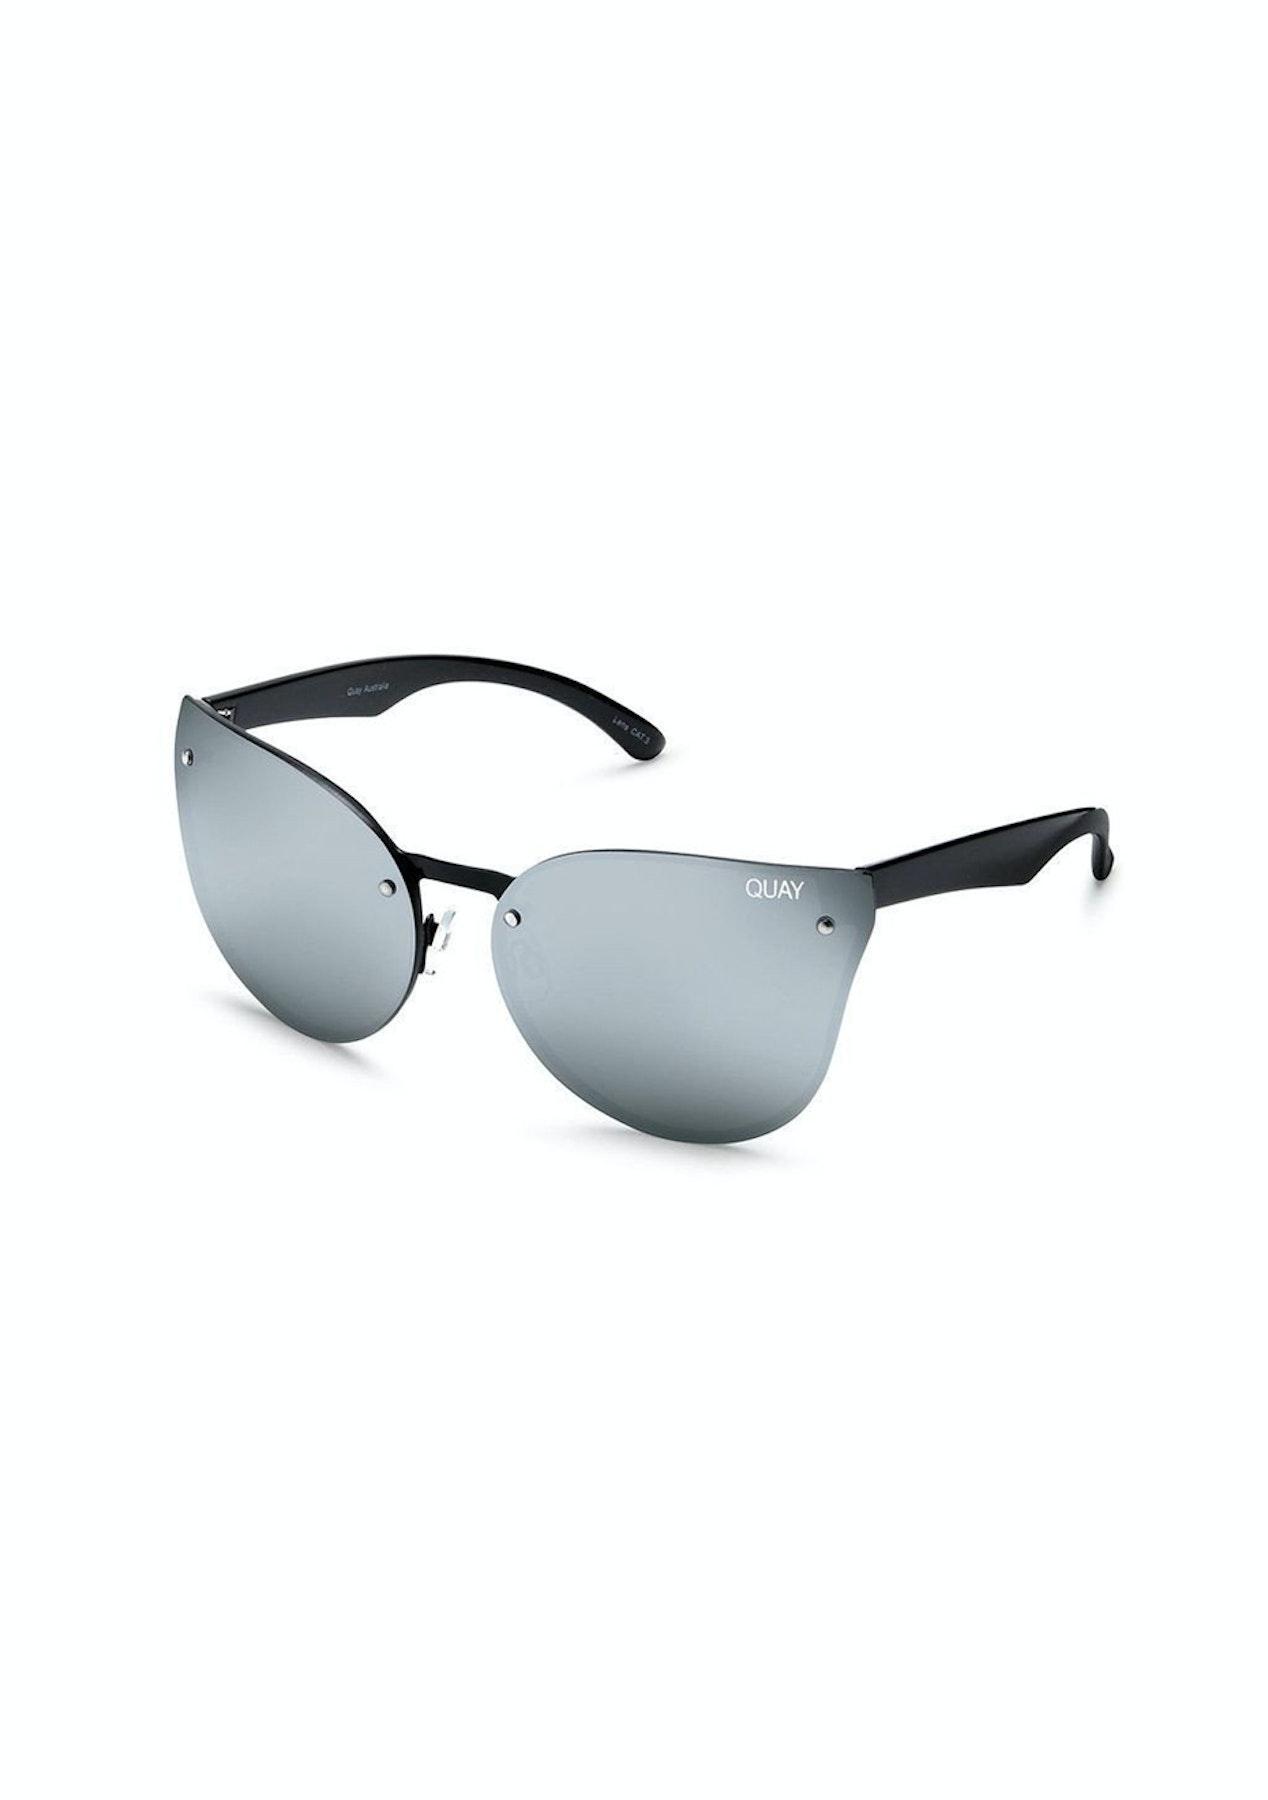 28d4eb10716 Quay Australia Higher Love Sunglasses - Quay Australia Eyewear From  29.95  - Onceit